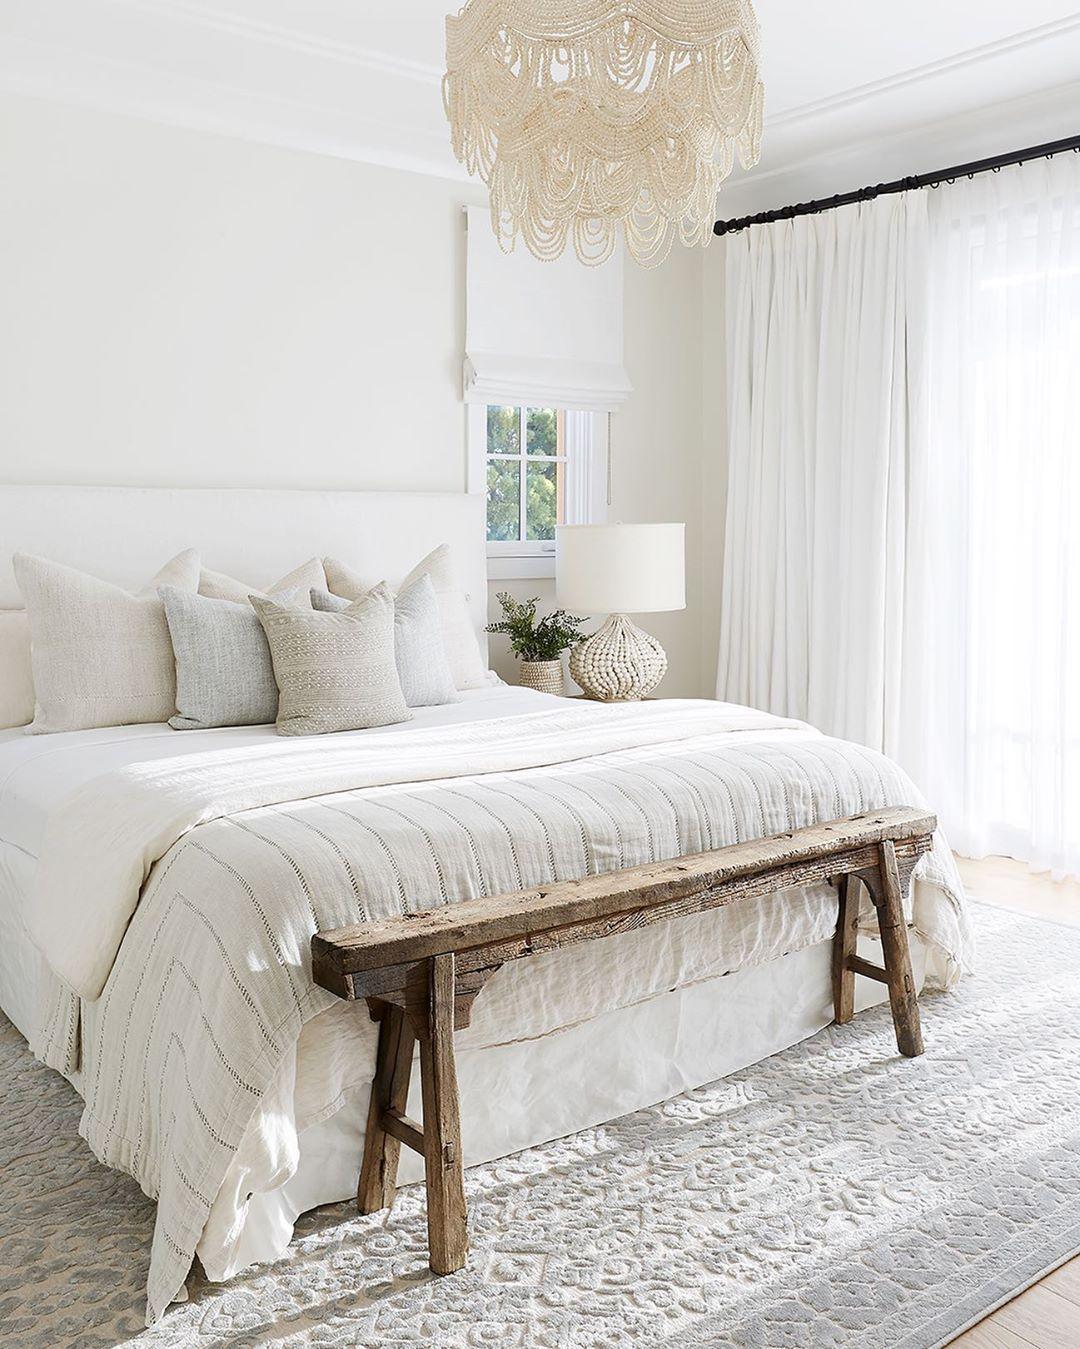 10 Best Bedroom Curtain Ideas - Easy Ideas for Bedroom Window